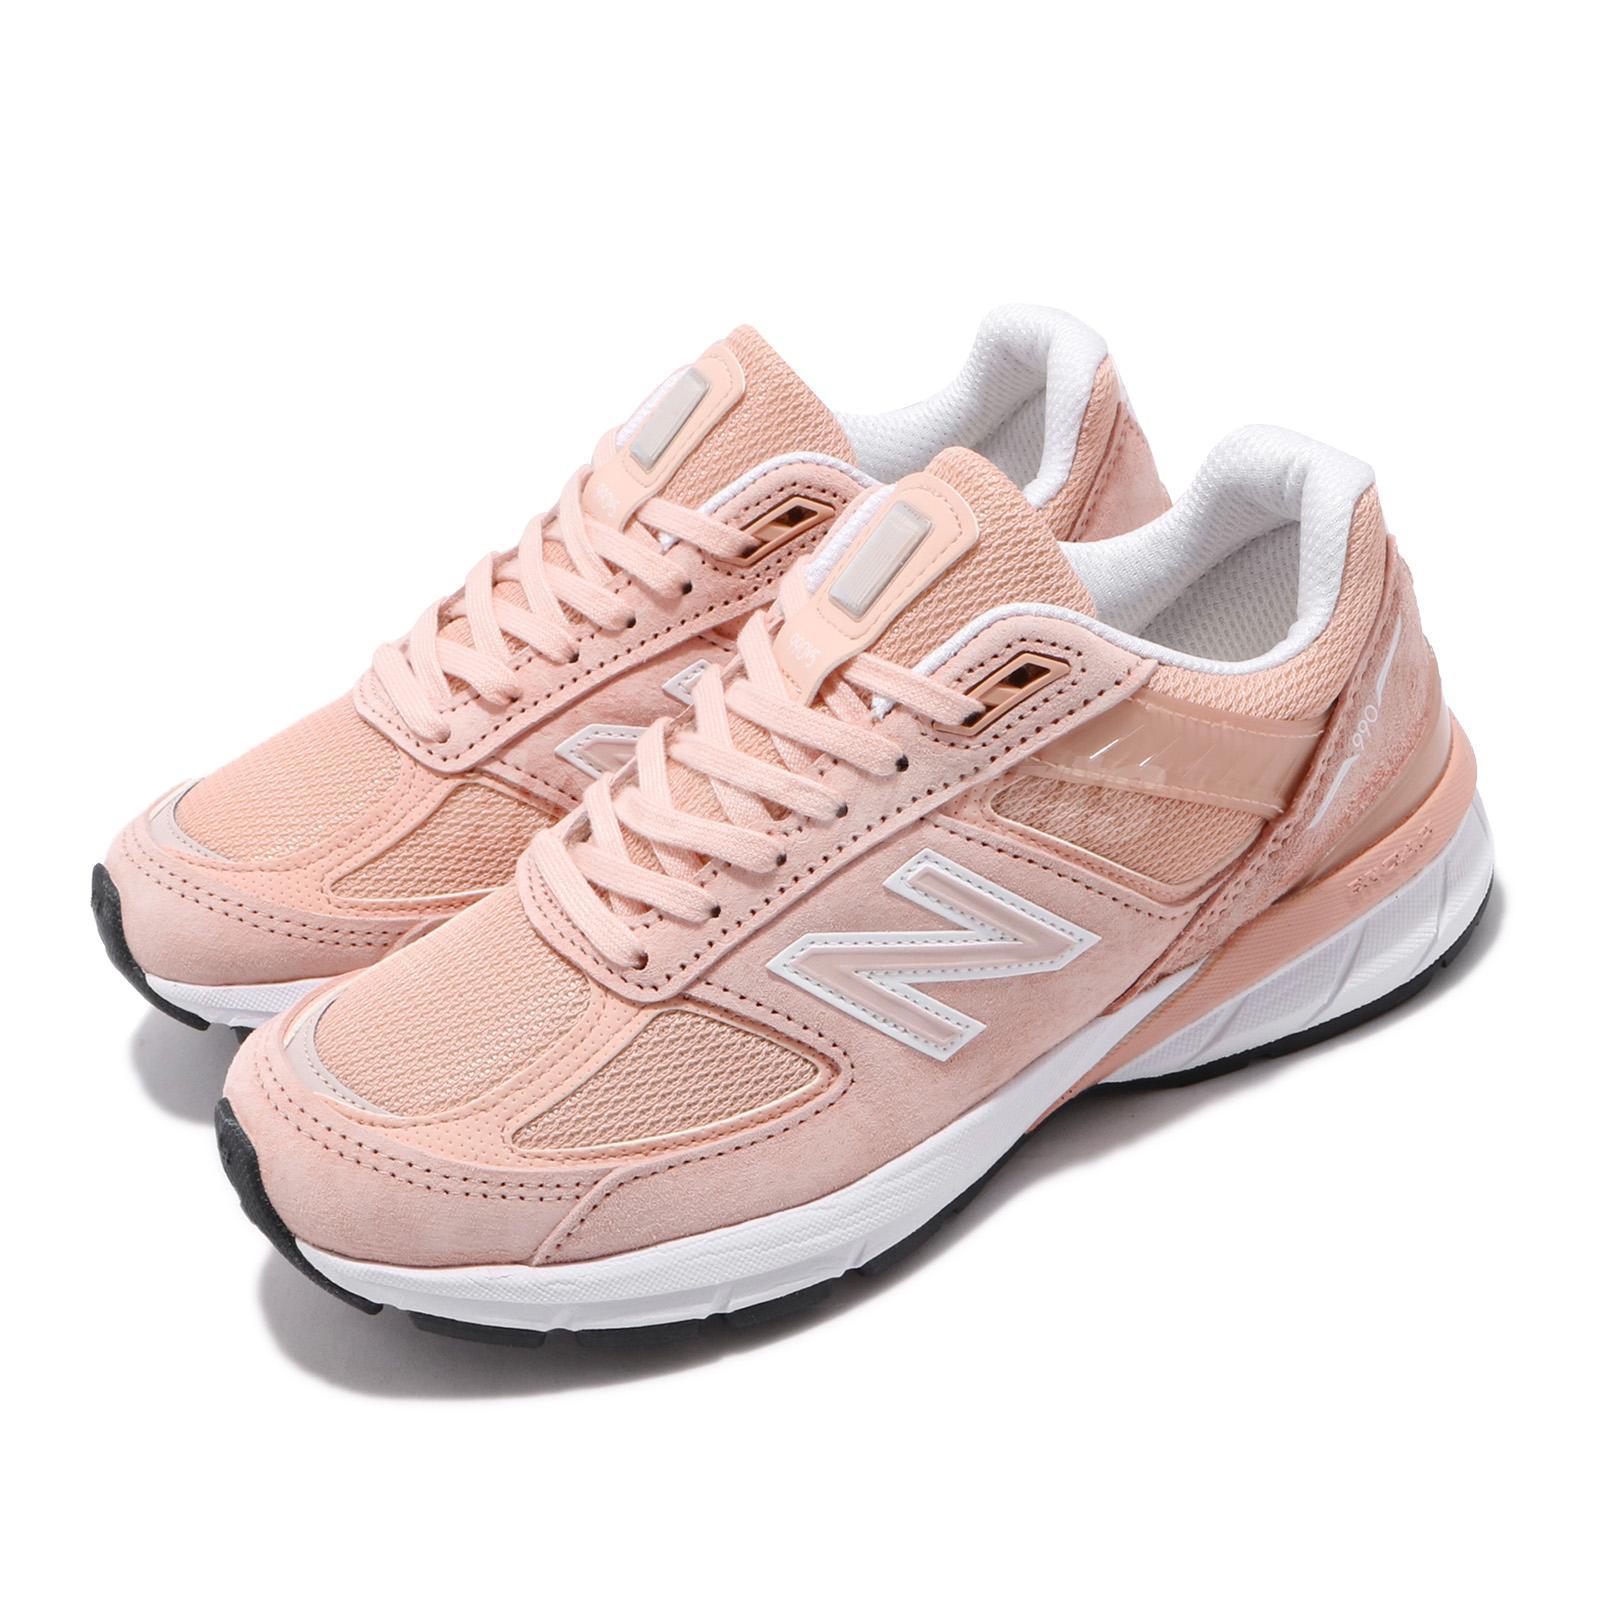 New Balance 990 v5 B Pink White Made In